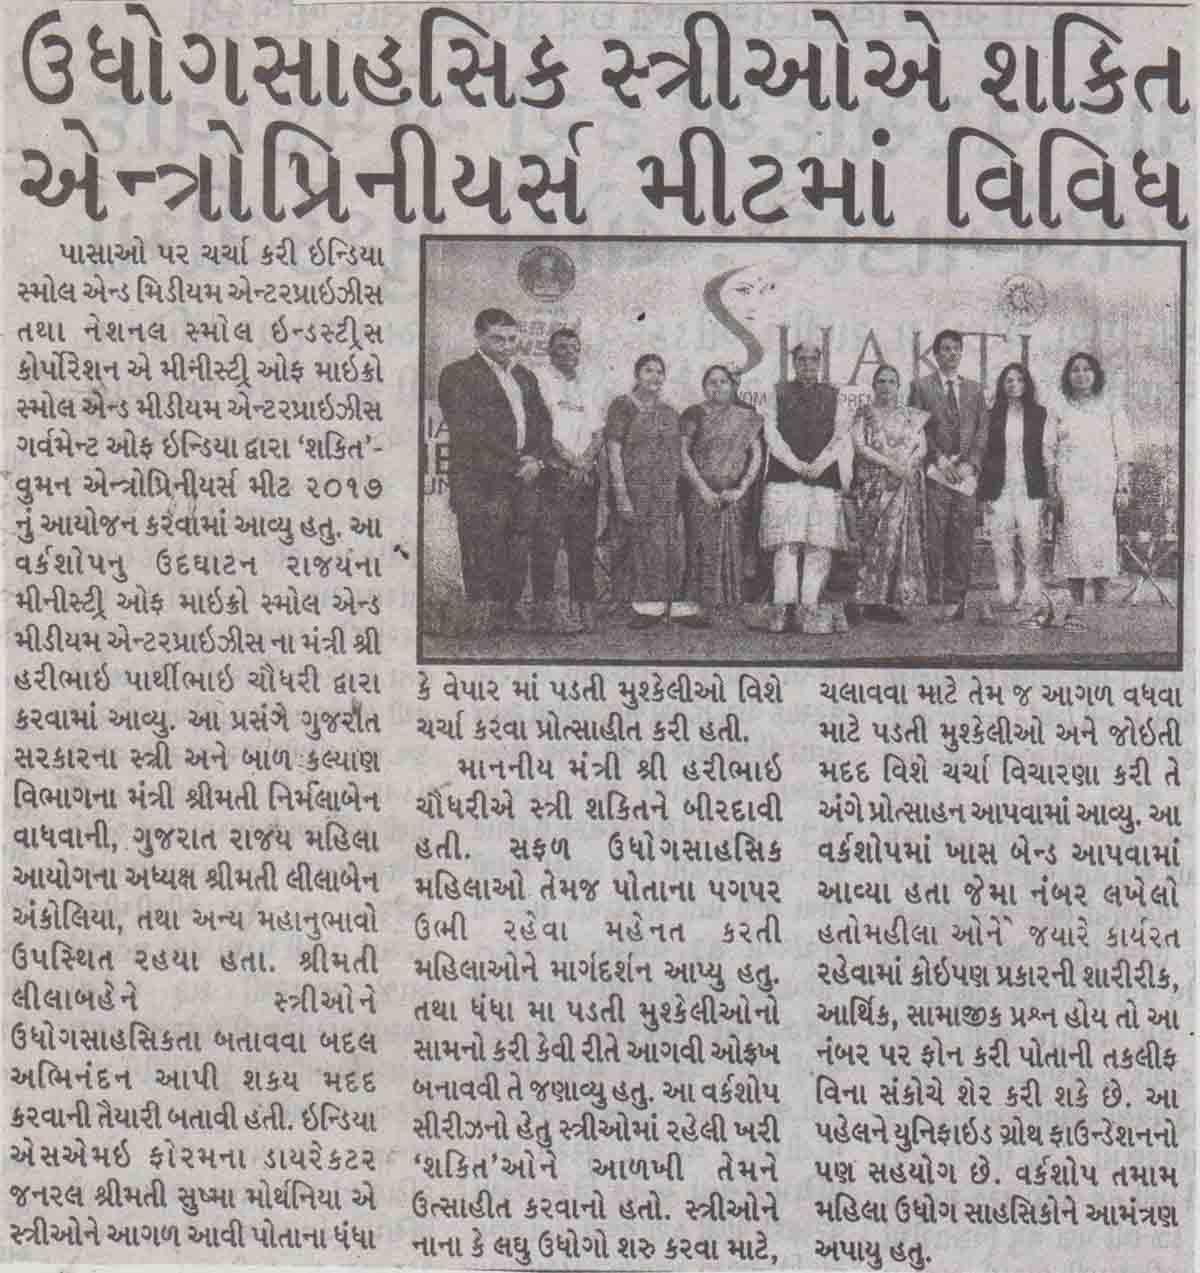 Gujarat Pranam 2 Aug 17 page 3